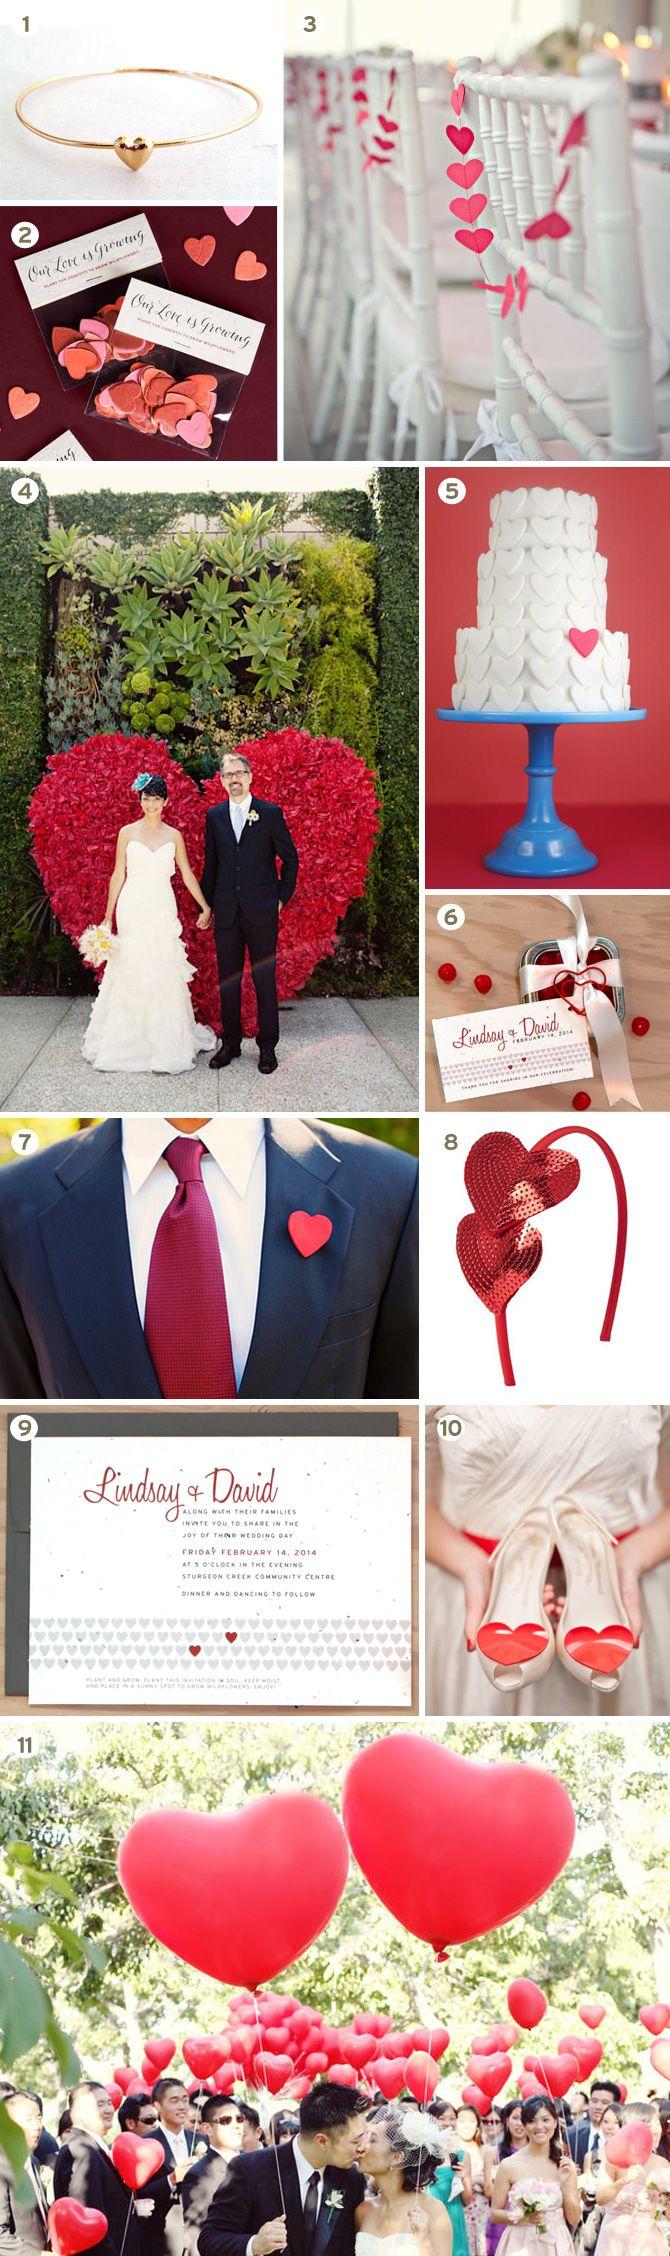 LOVE this! - Heart Theme Wedding Inspiration Board from www.botanicalpaperworks.com